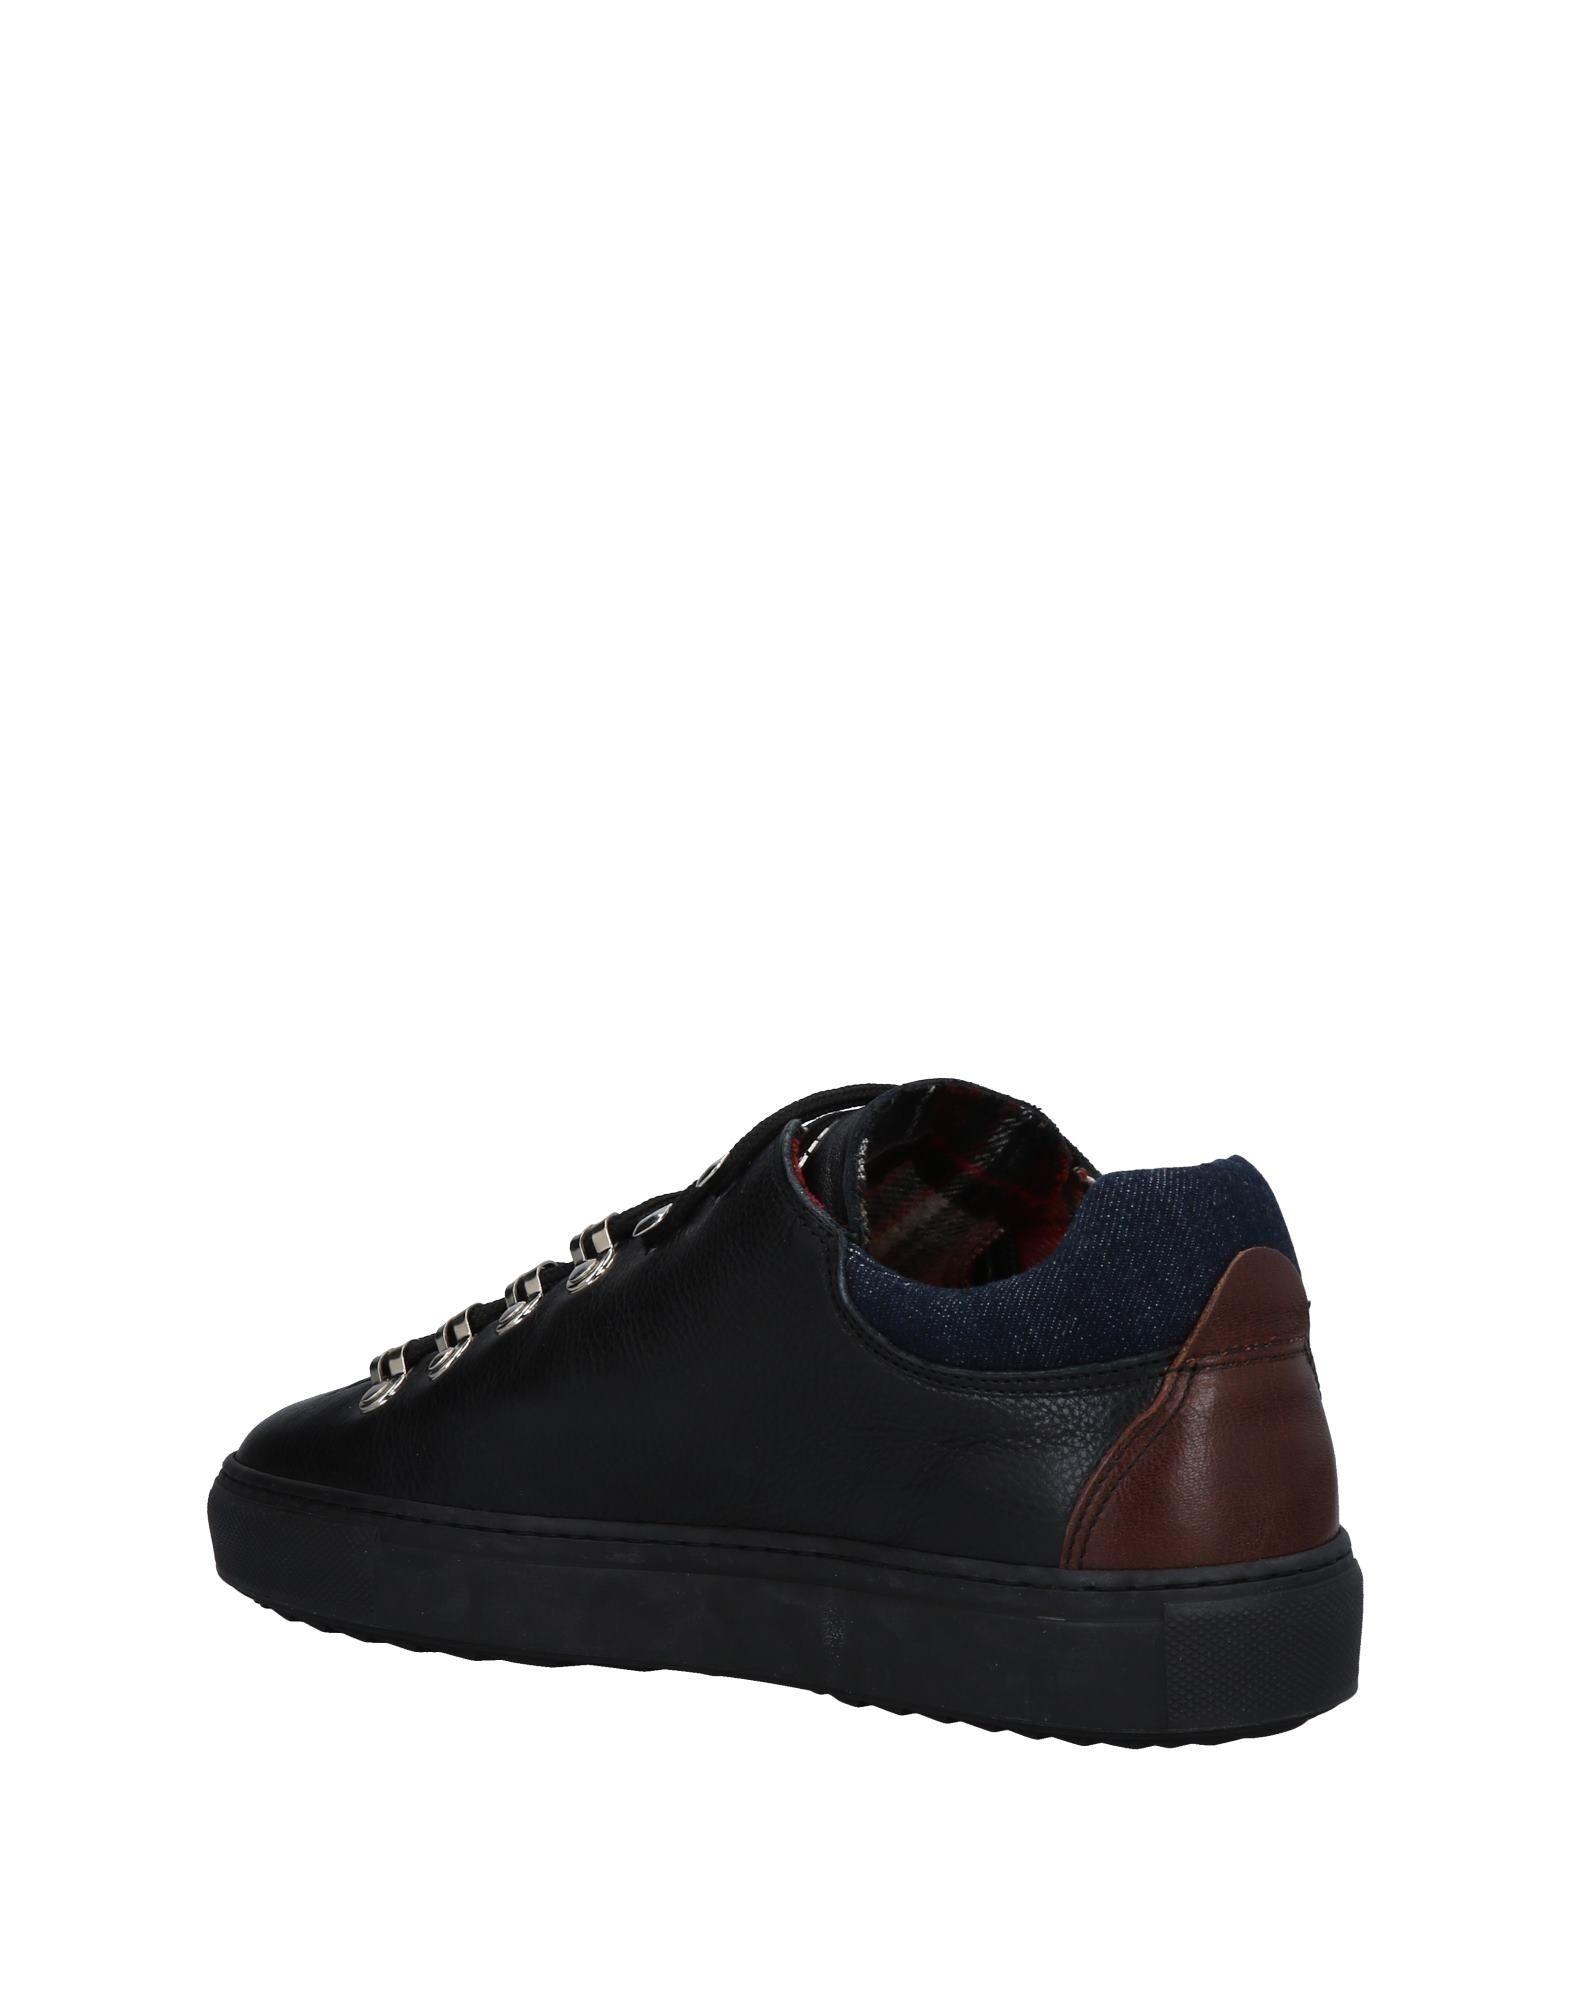 Dsquared2 Sneakers Herren Qualität  11485420BU Gute Qualität Herren beliebte Schuhe 6798e5